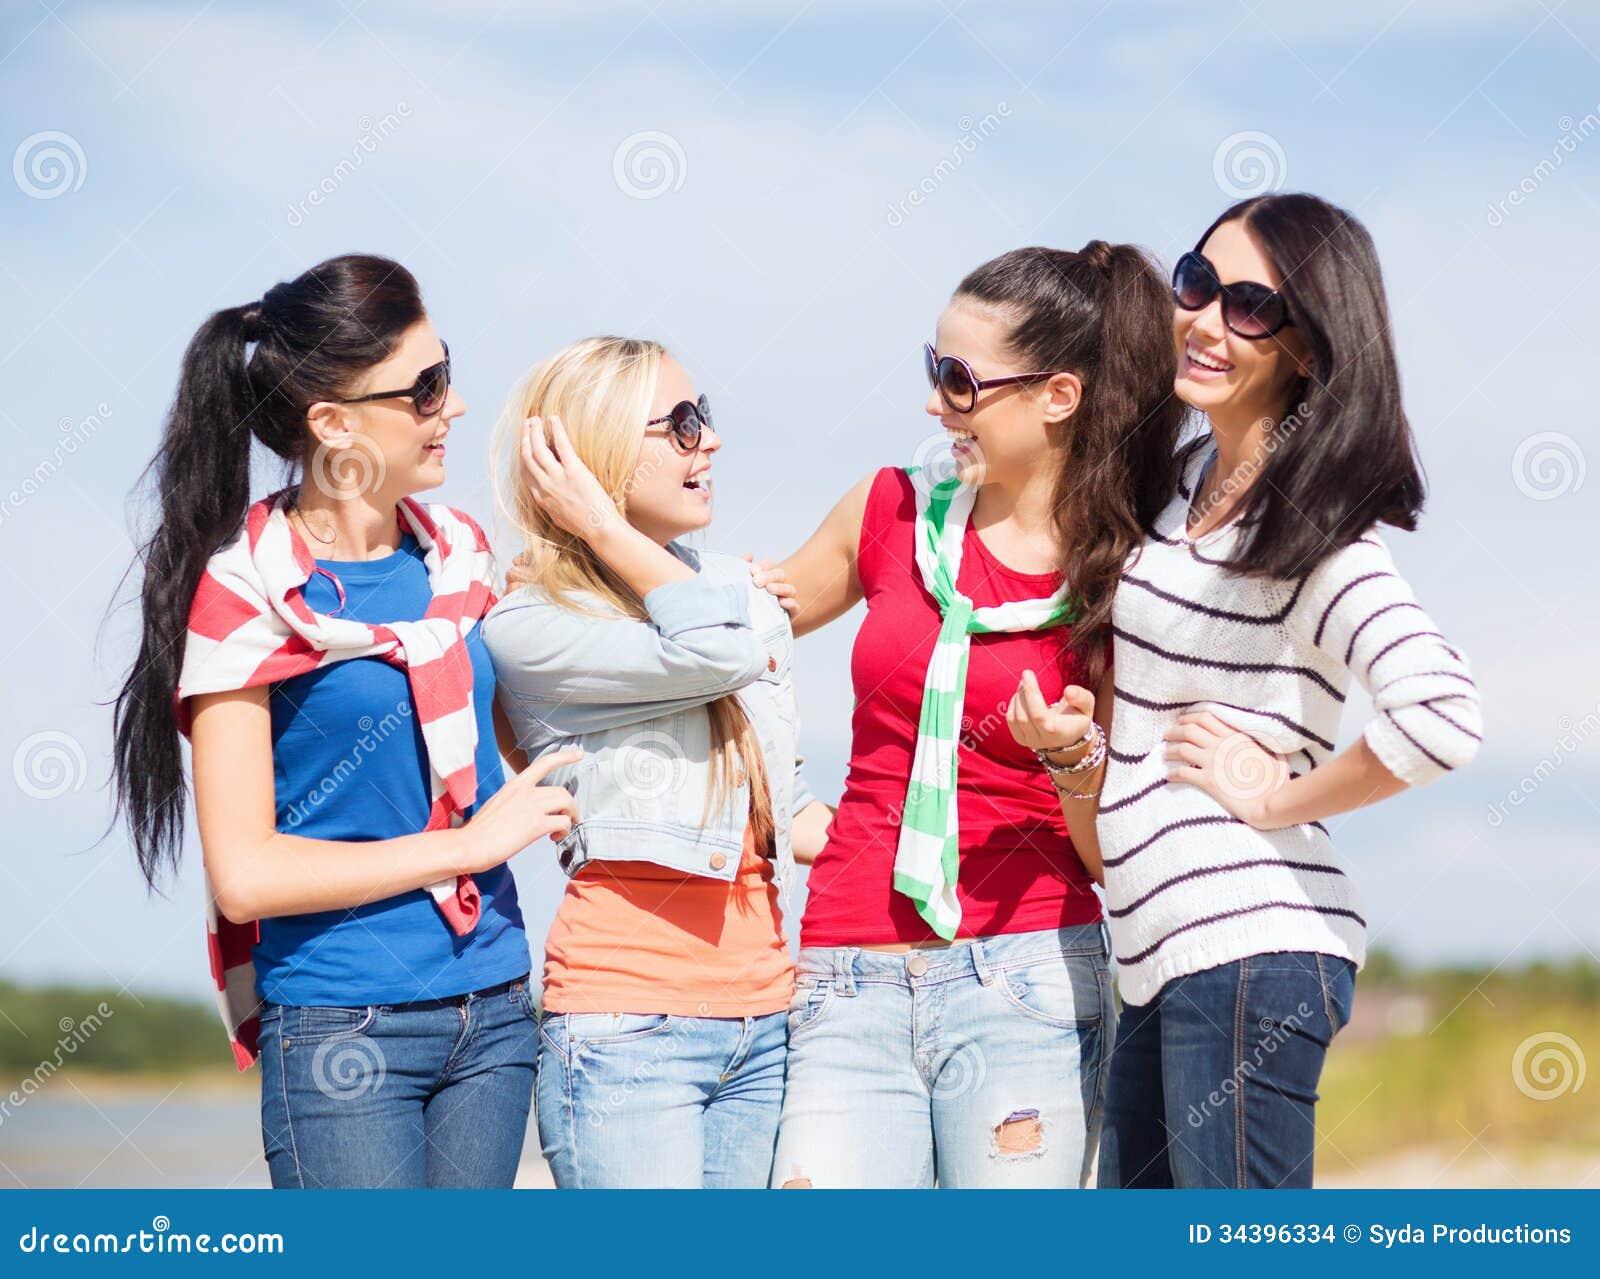 online dating sites bangalore